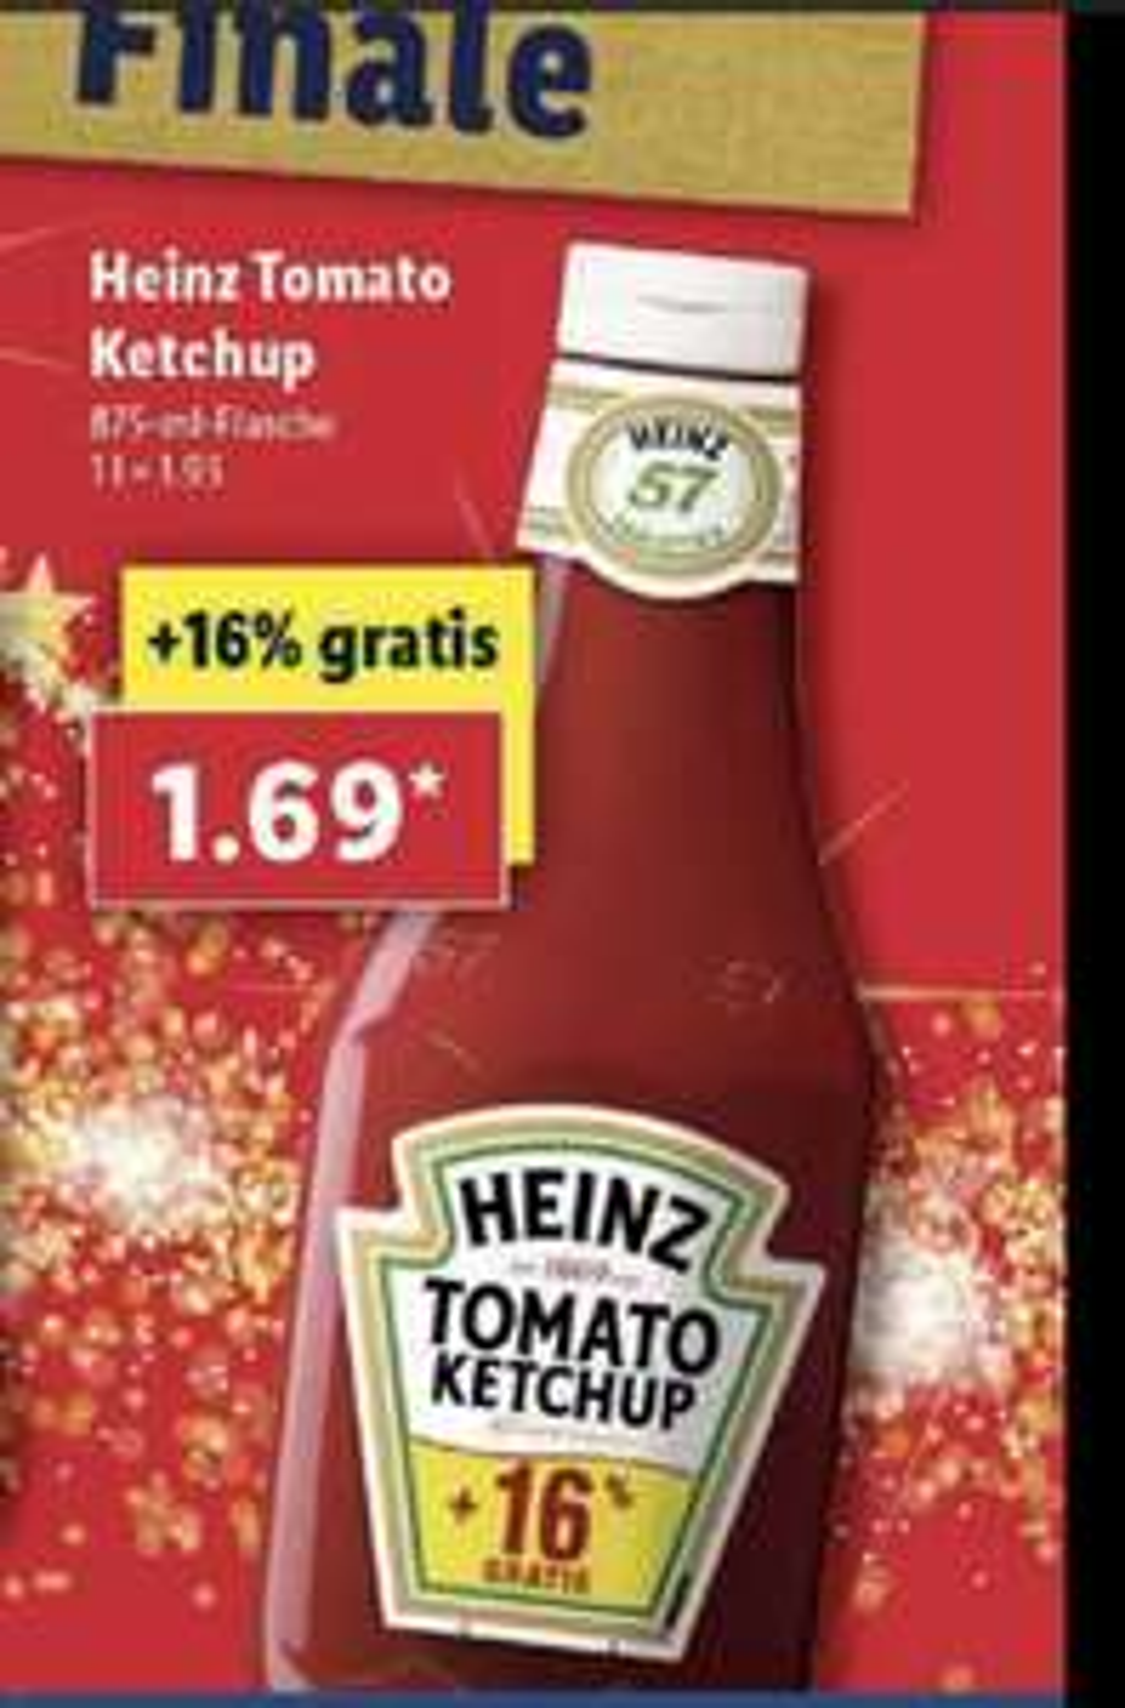 LIDL Heinz Ketchup 875 ml. Liter Preis 1,93 €